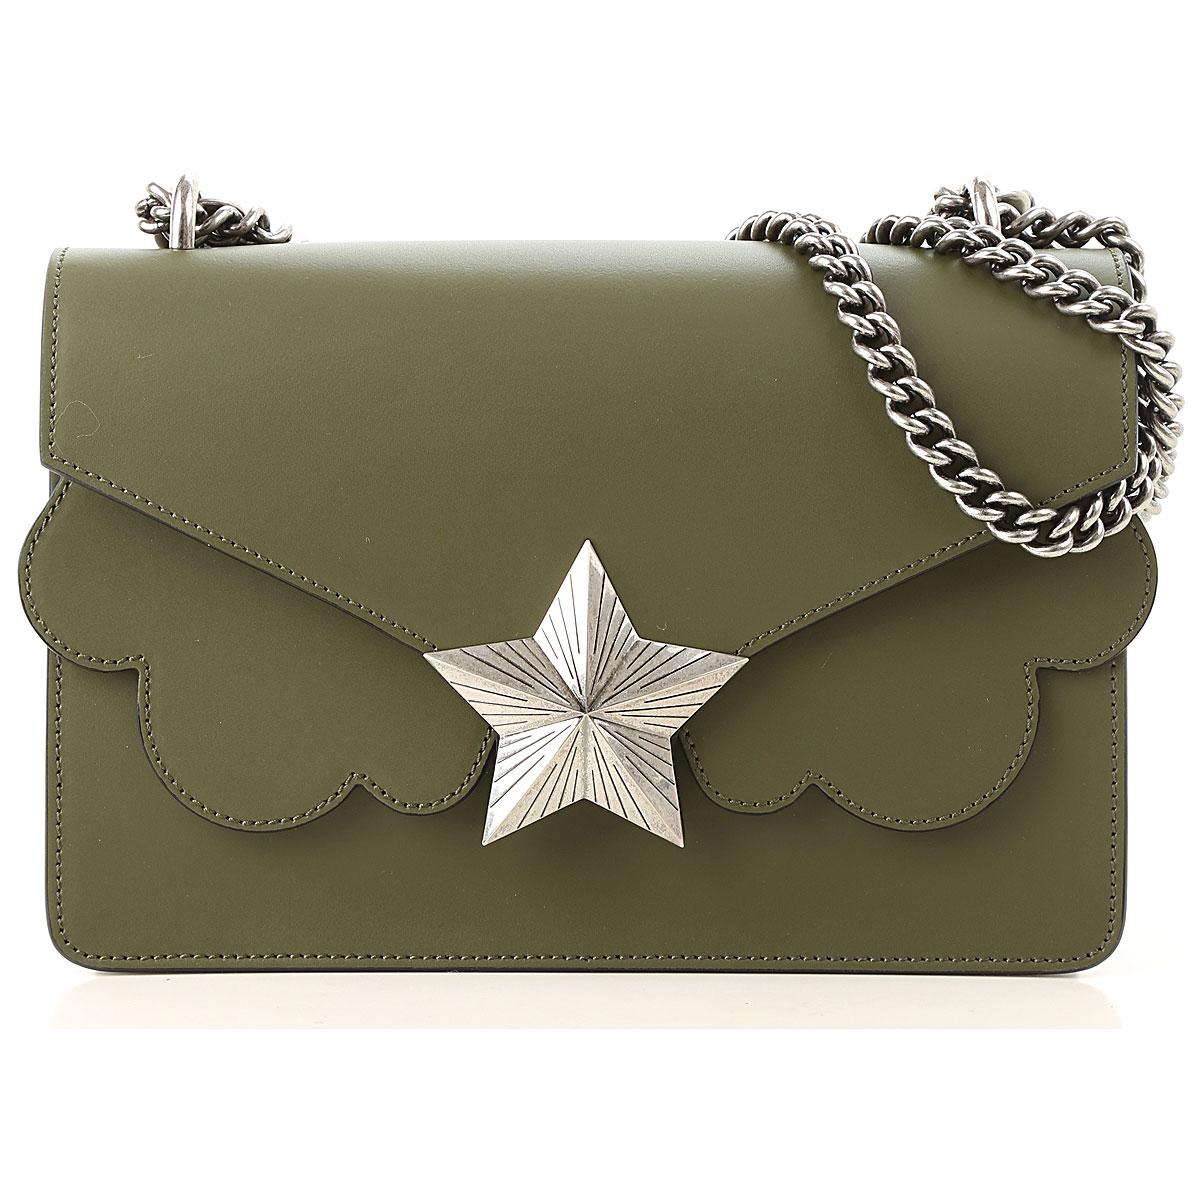 Image of Les Jeunes Etoiles Shoulder Bag for Women, Green, Leather, 2017